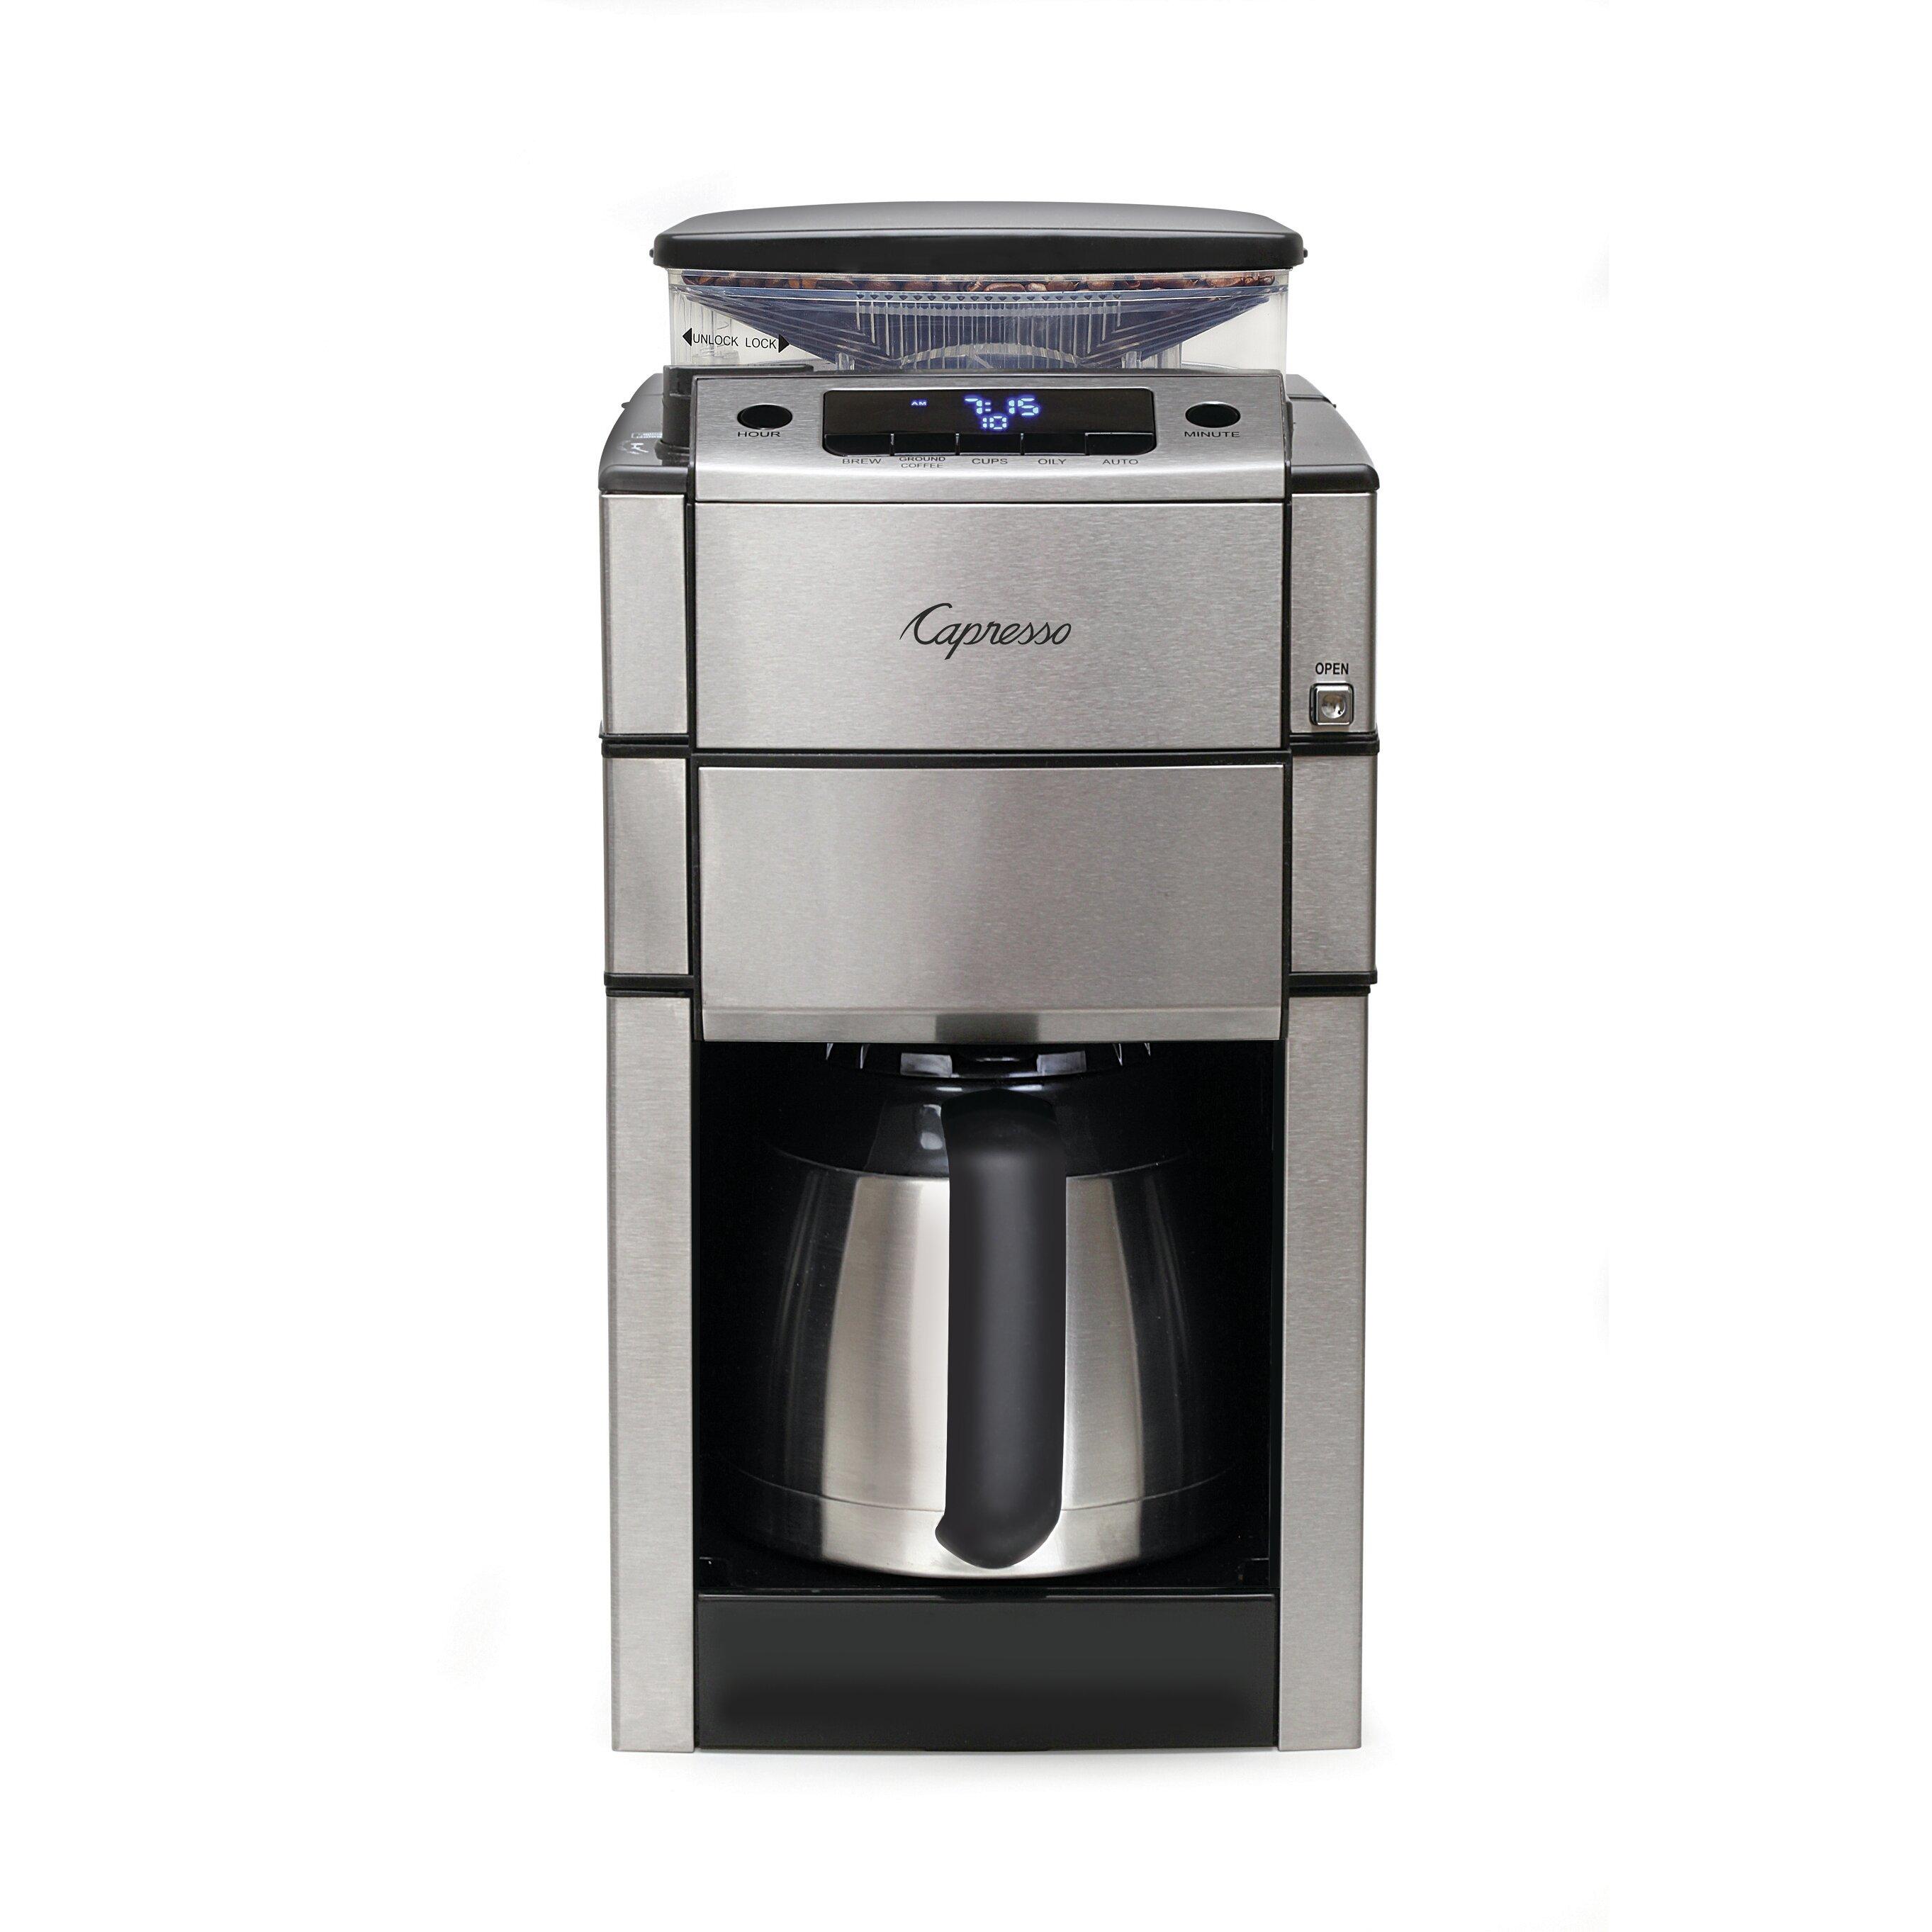 Best Coffee Maker Under Usd 40 : Capresso Coffee Team Pro Plus Coffee Maker & Reviews Wayfair